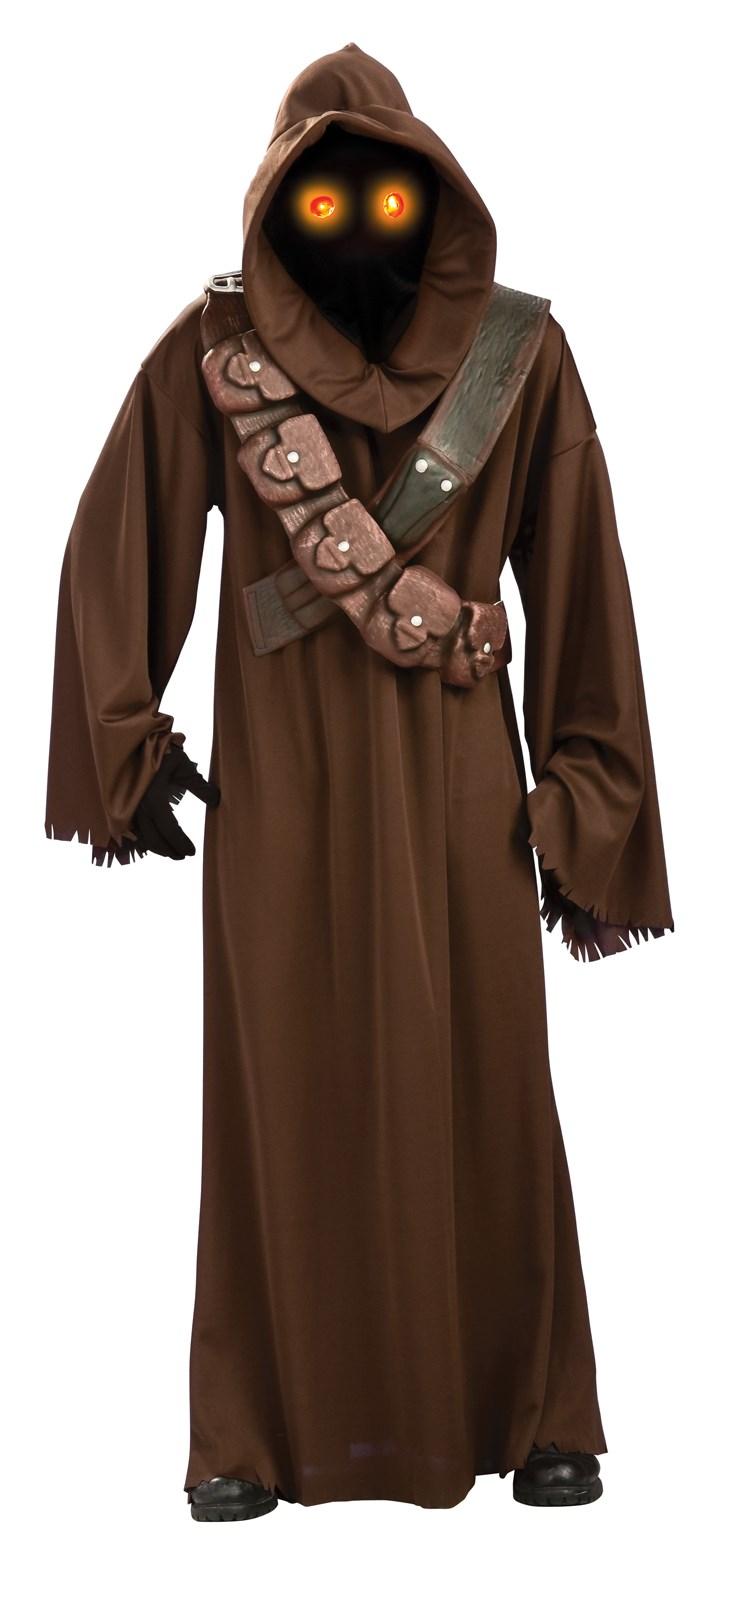 ... costume themes tv movies star wars star wars jawa adult costume